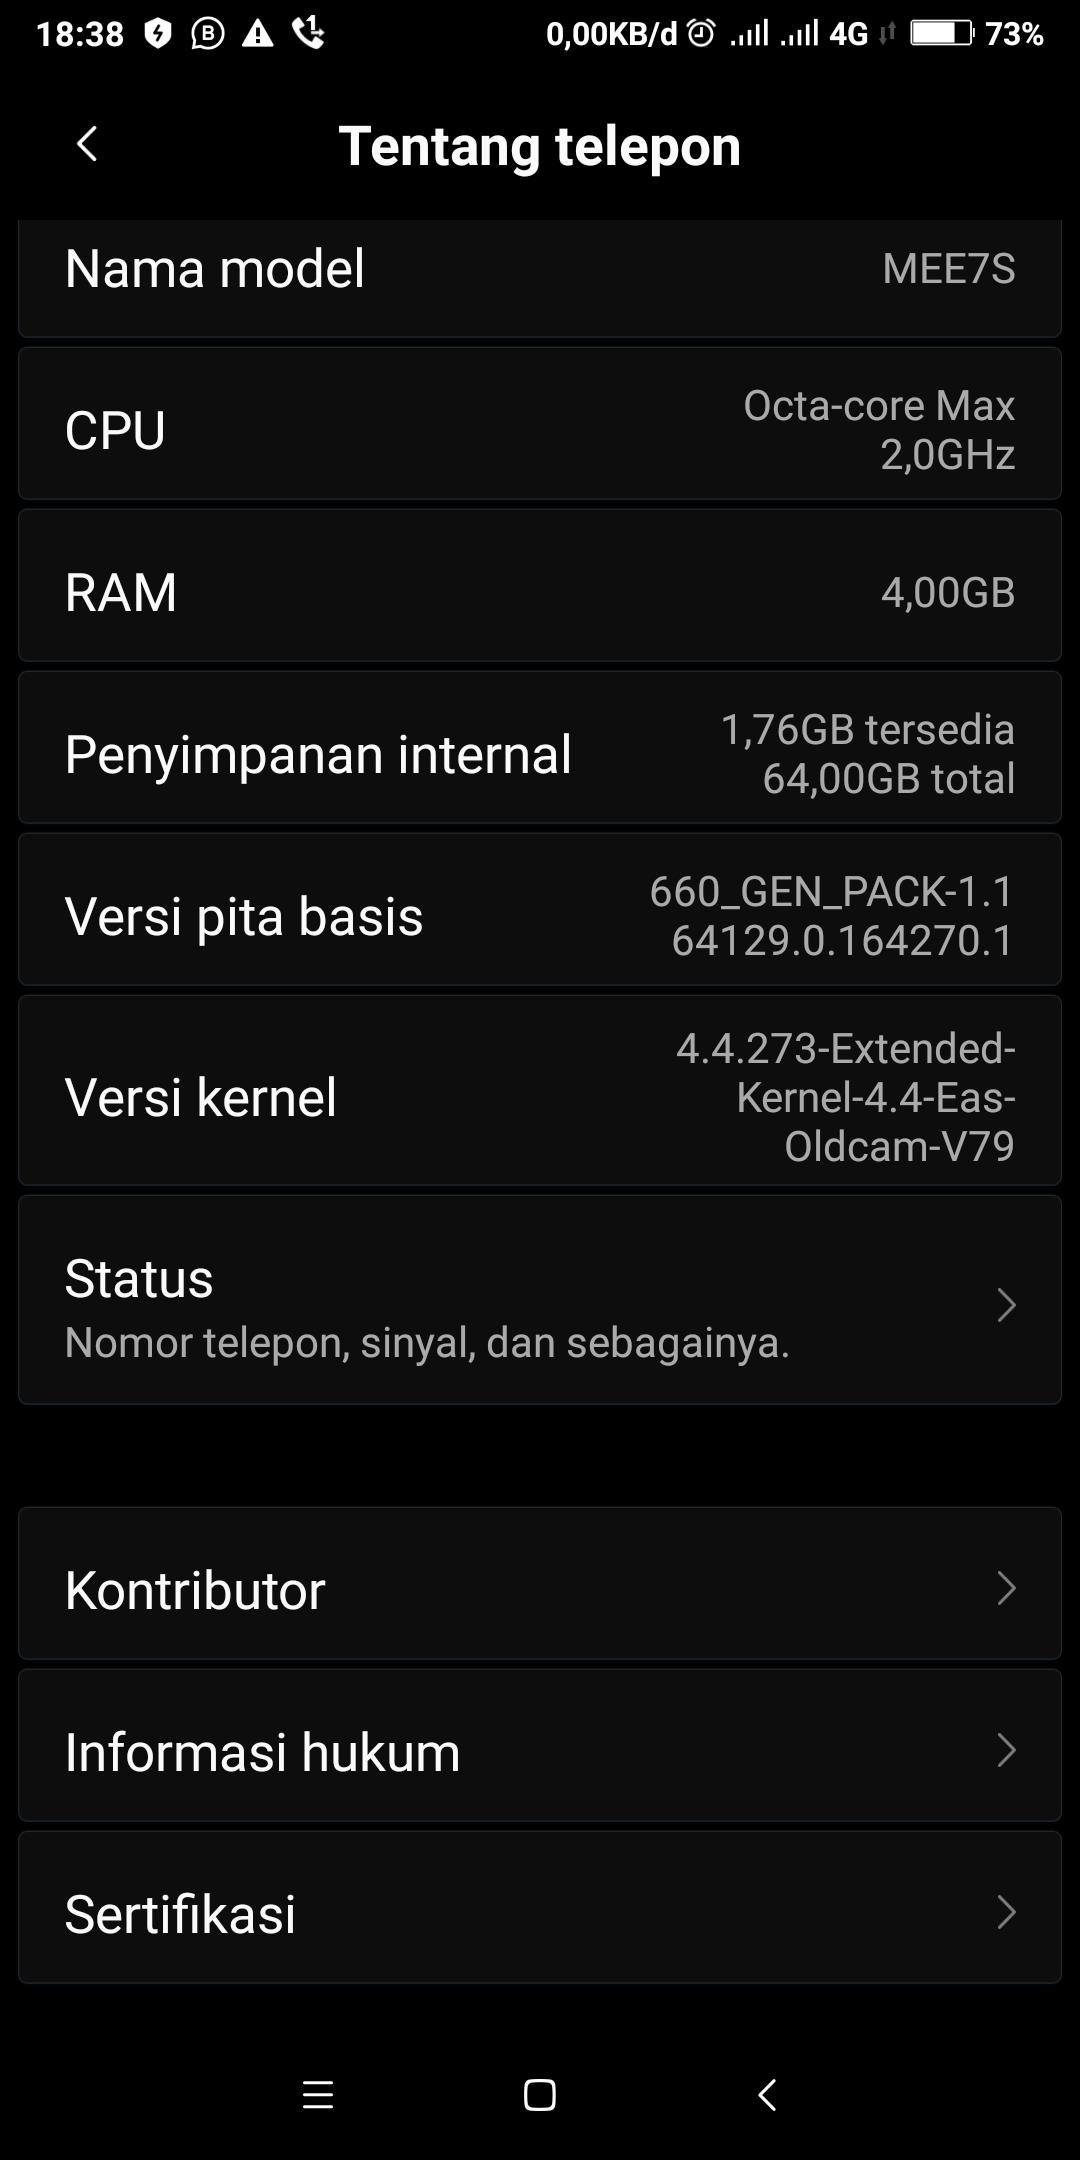 Screenshot_2021-06-25-18-38-46-024_com.android.settings.png